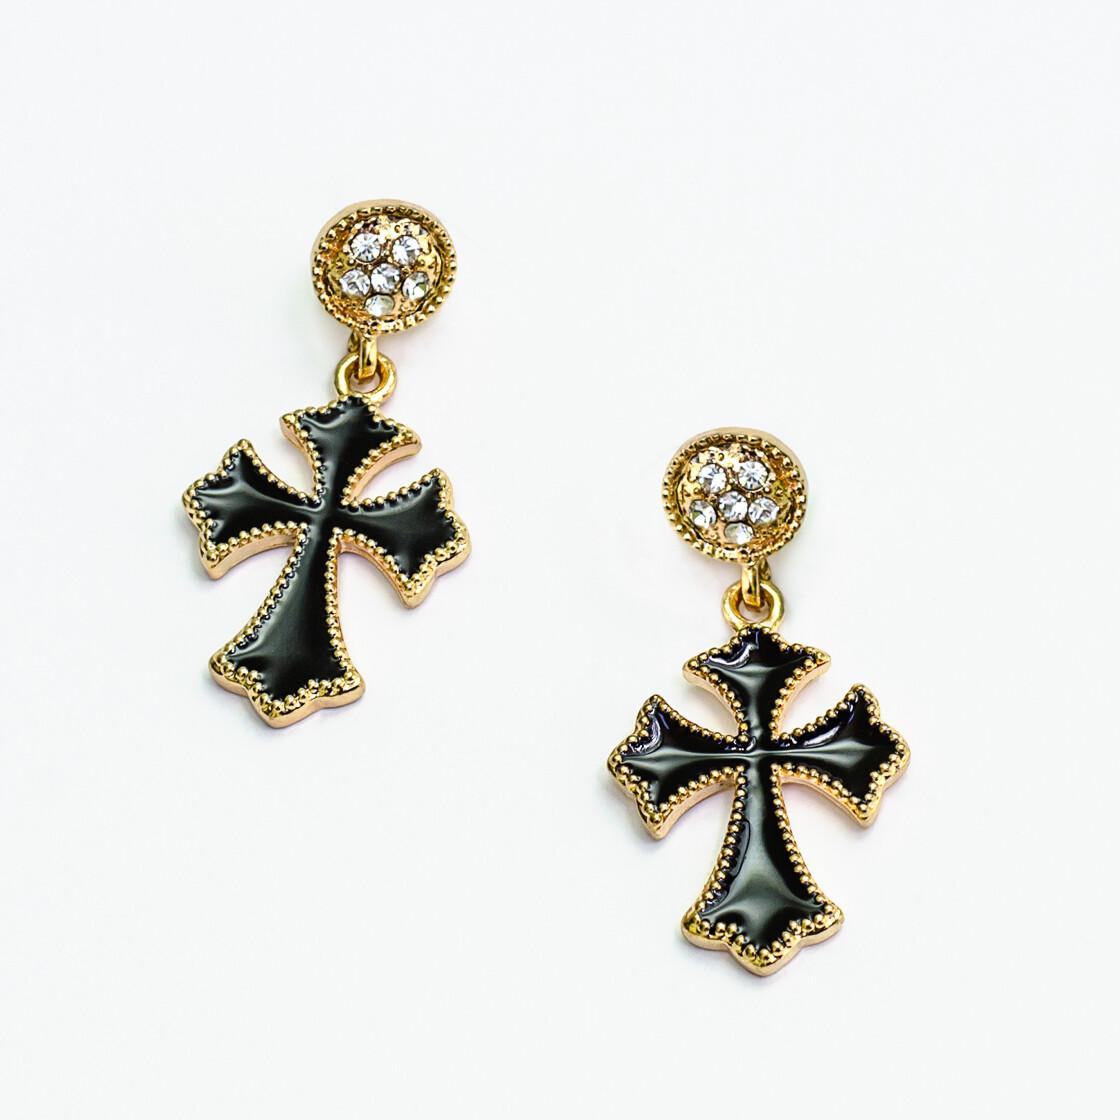 Goth Cross Earrings - BLACKDOLL ACCESSORIES